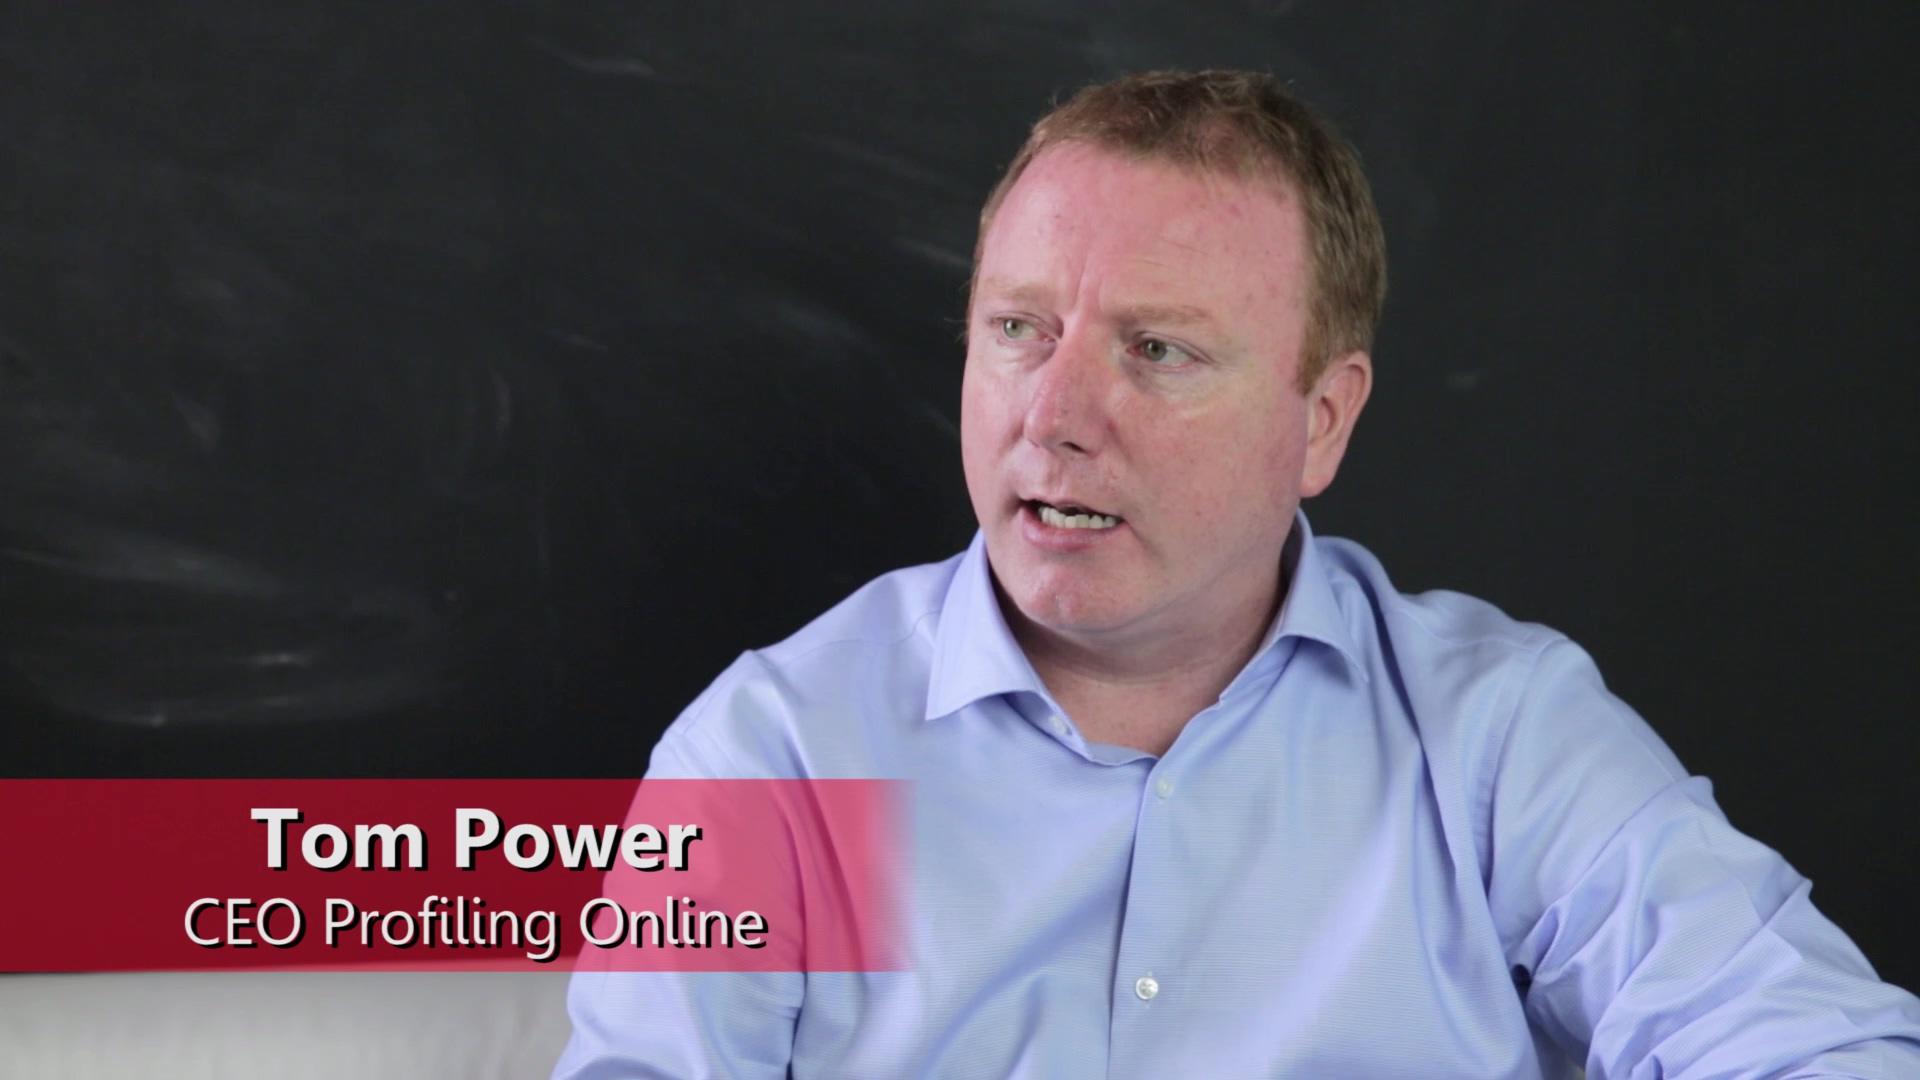 Video - Tom Power - Testimonial